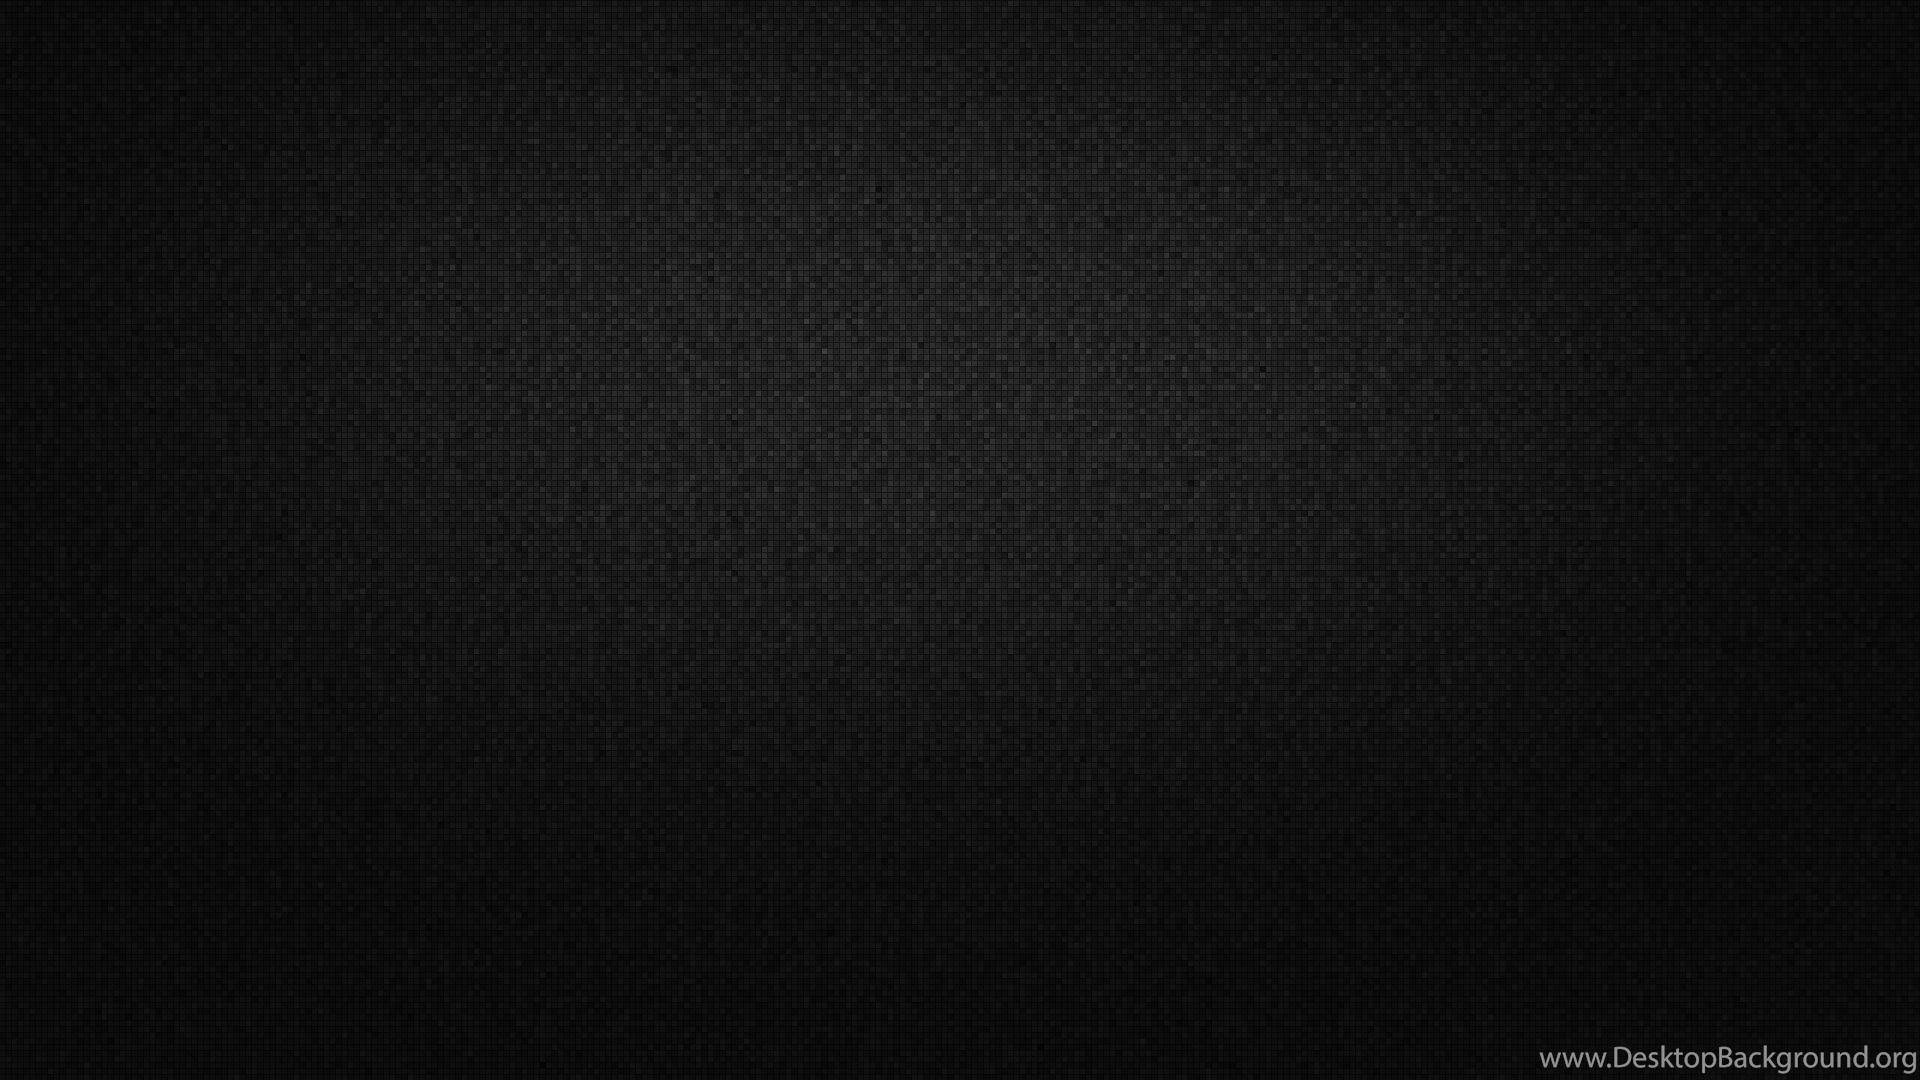 Black Wall Wallpapers Hd Wallpapers Lovely Desktop Background